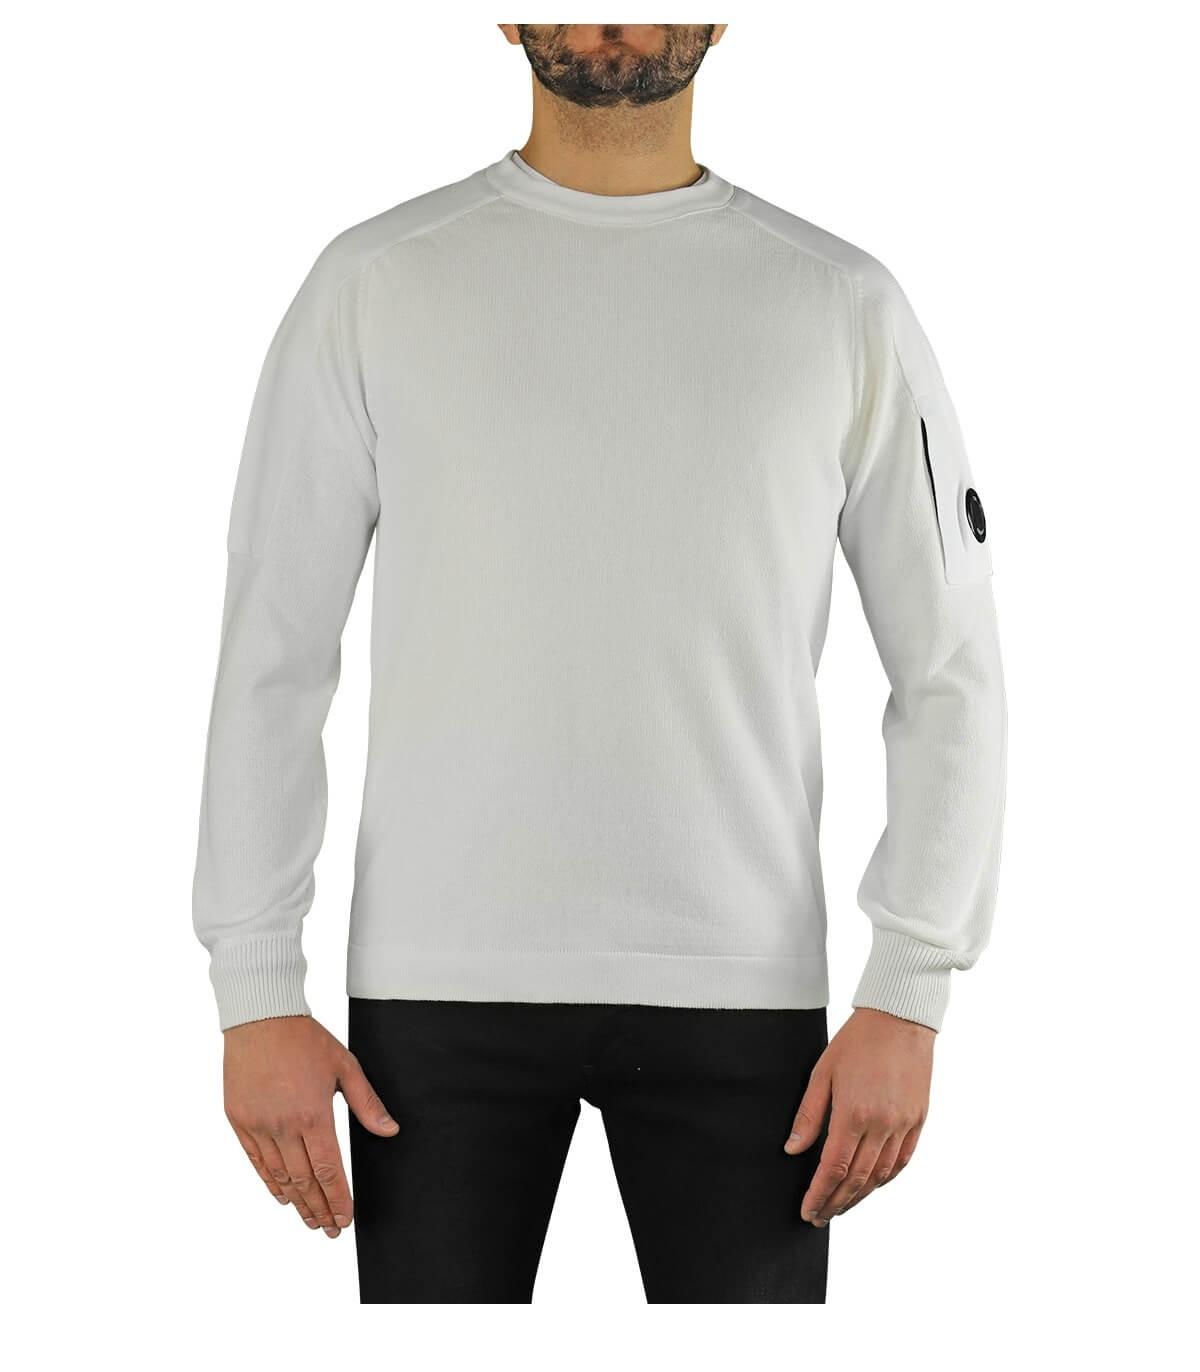 C.p. Company Sweaters WHITE CREW NECK SWEATER